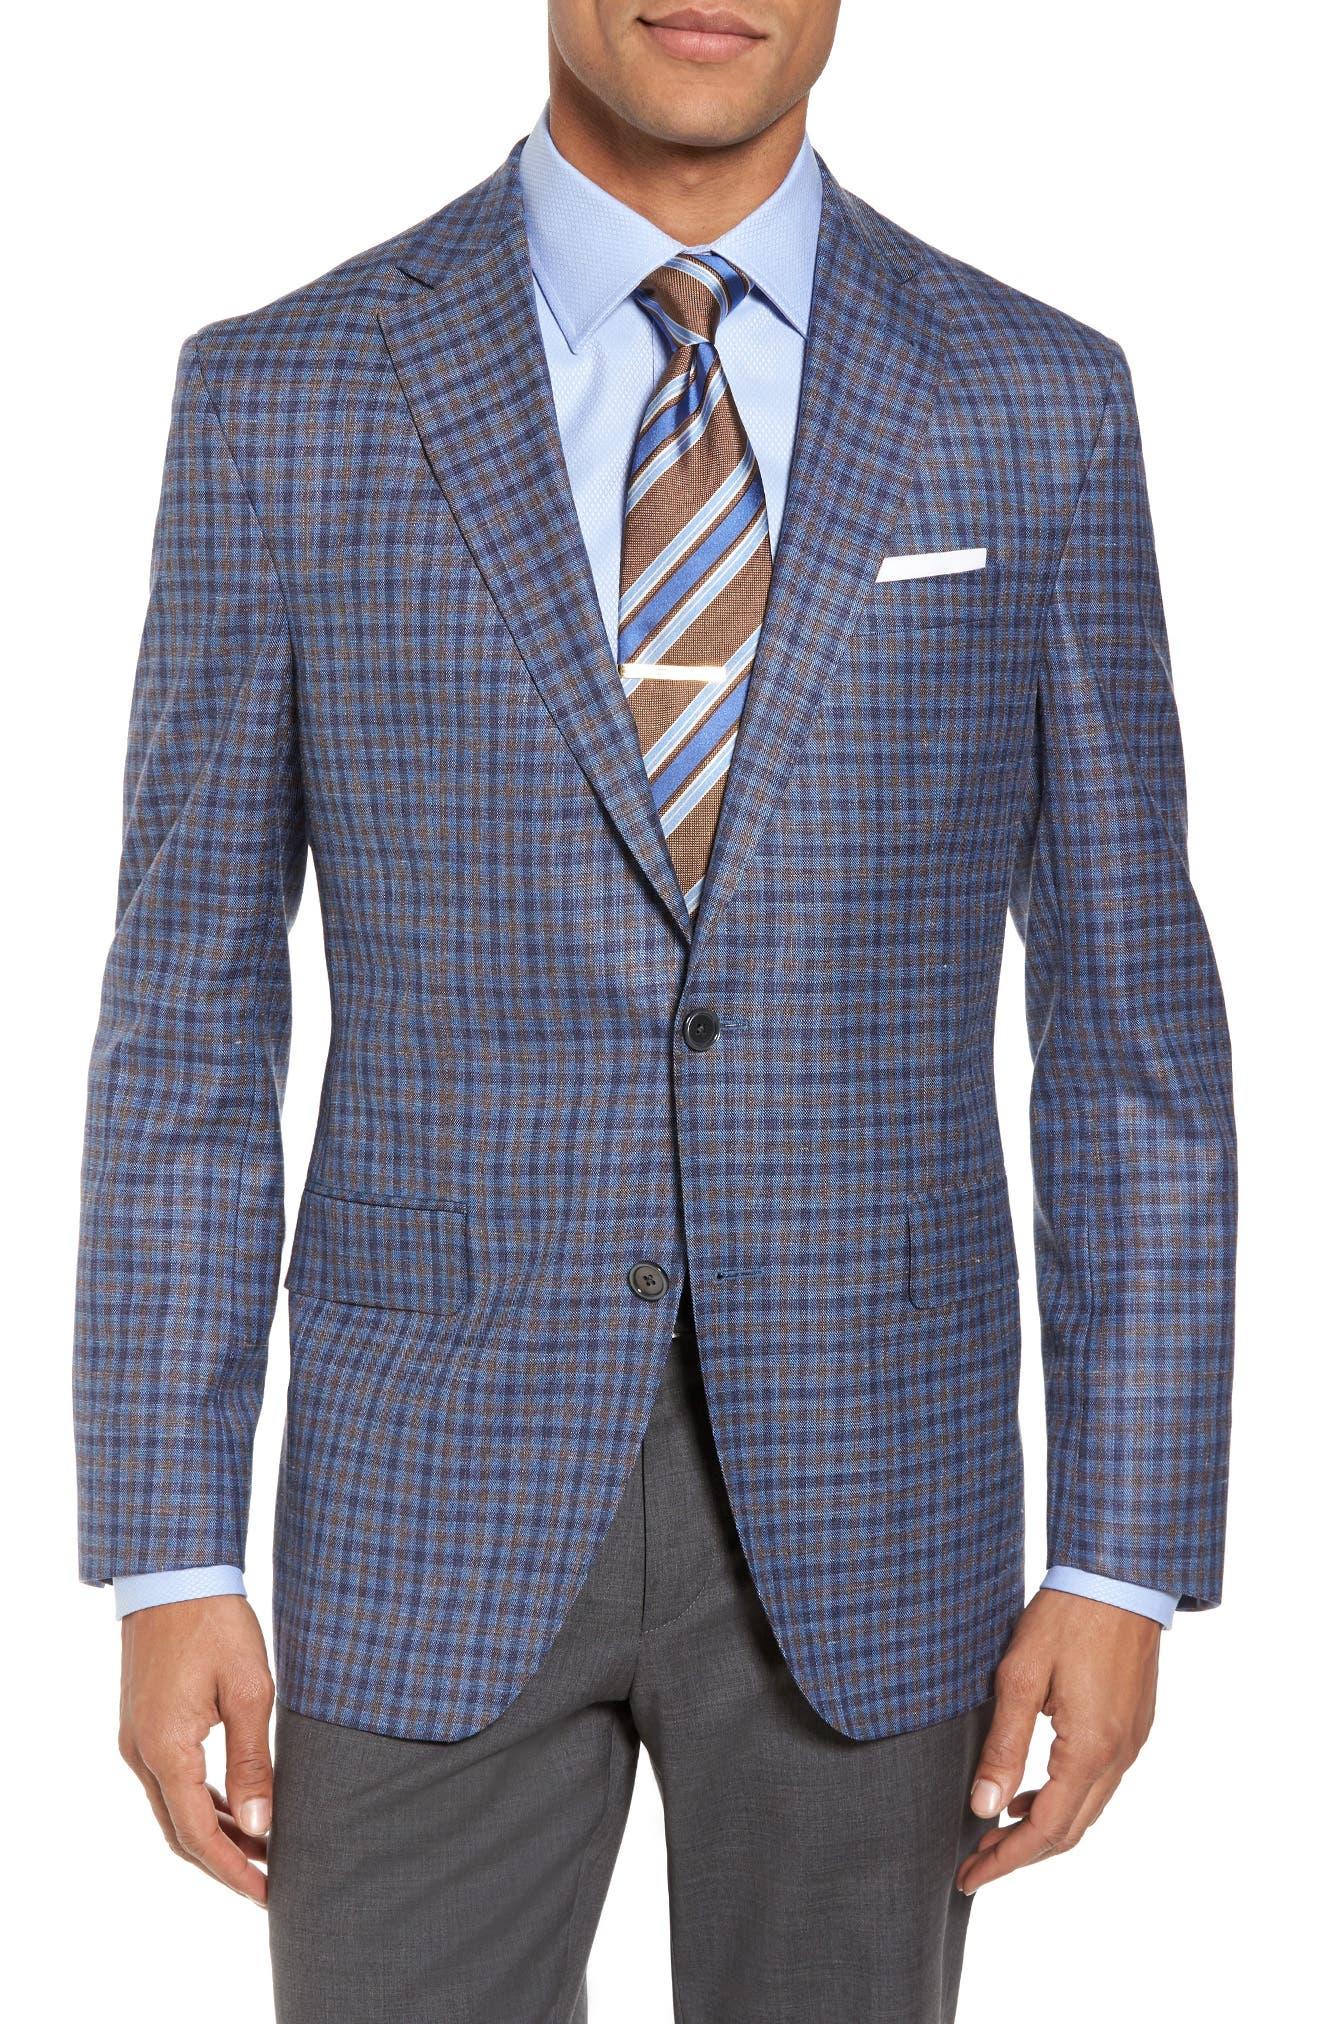 Main Image - David Donahue Ashton Classic Fit Stretch Check Wool Blend Sport Coat